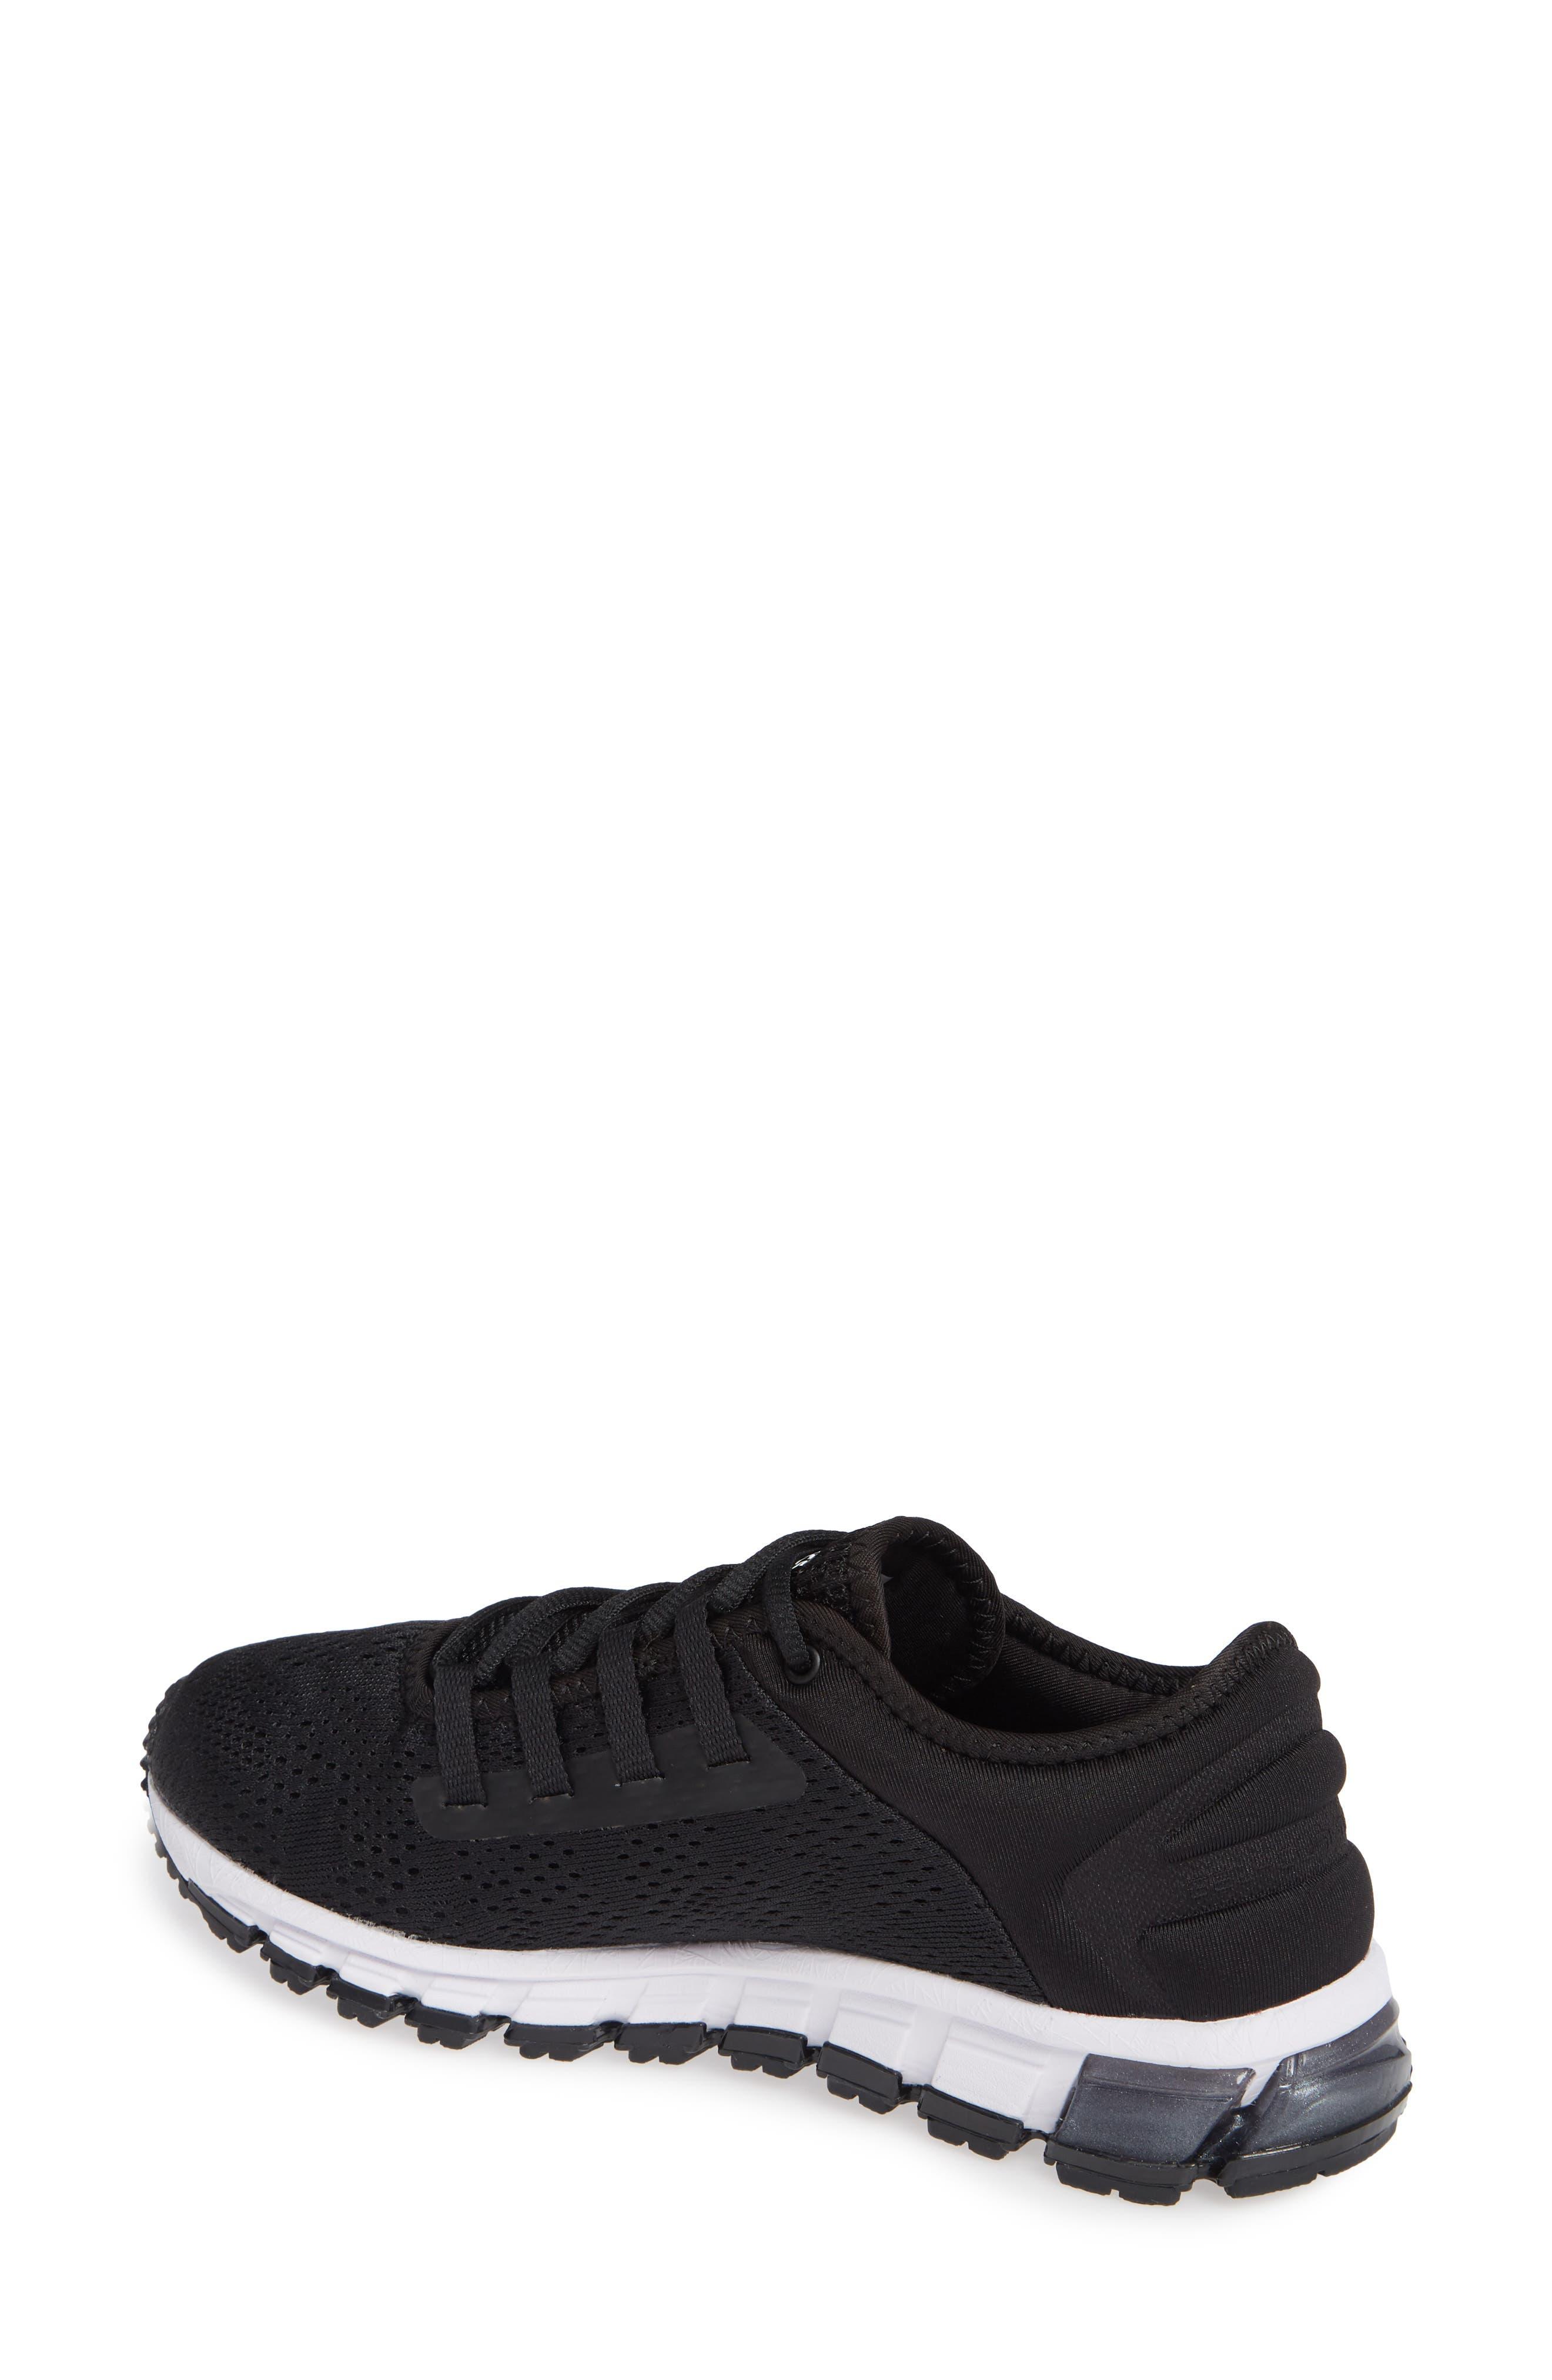 GEL Quantum 180 3 Running Shoe,                             Alternate thumbnail 2, color,                             BLACK/ WHITE